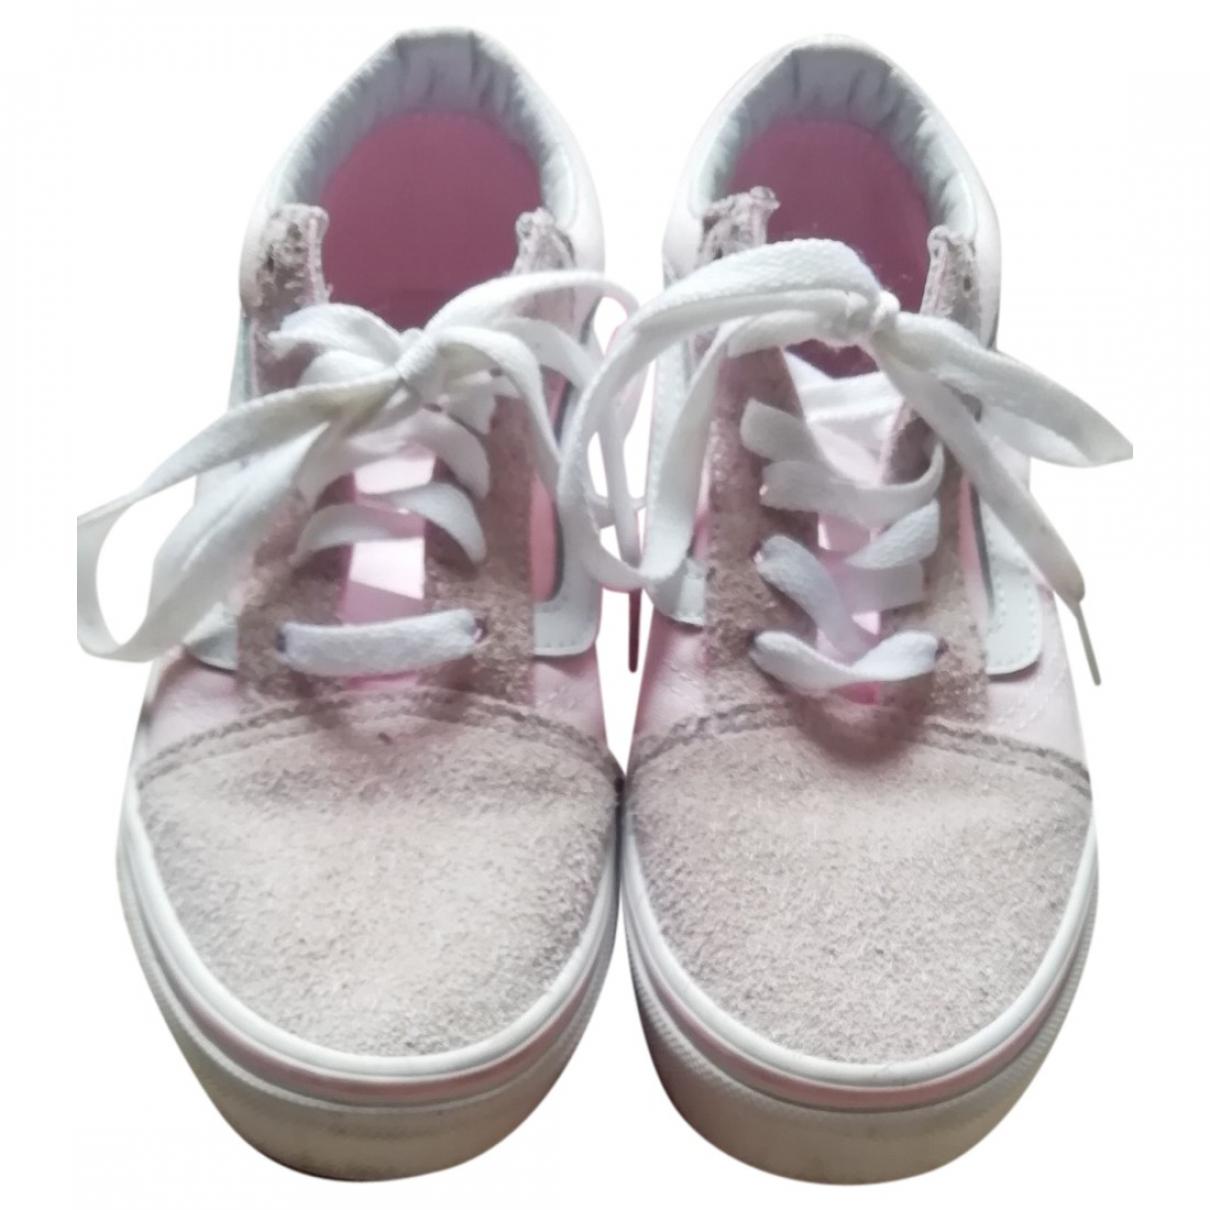 Vans - Baskets   pour enfant en suede - rose